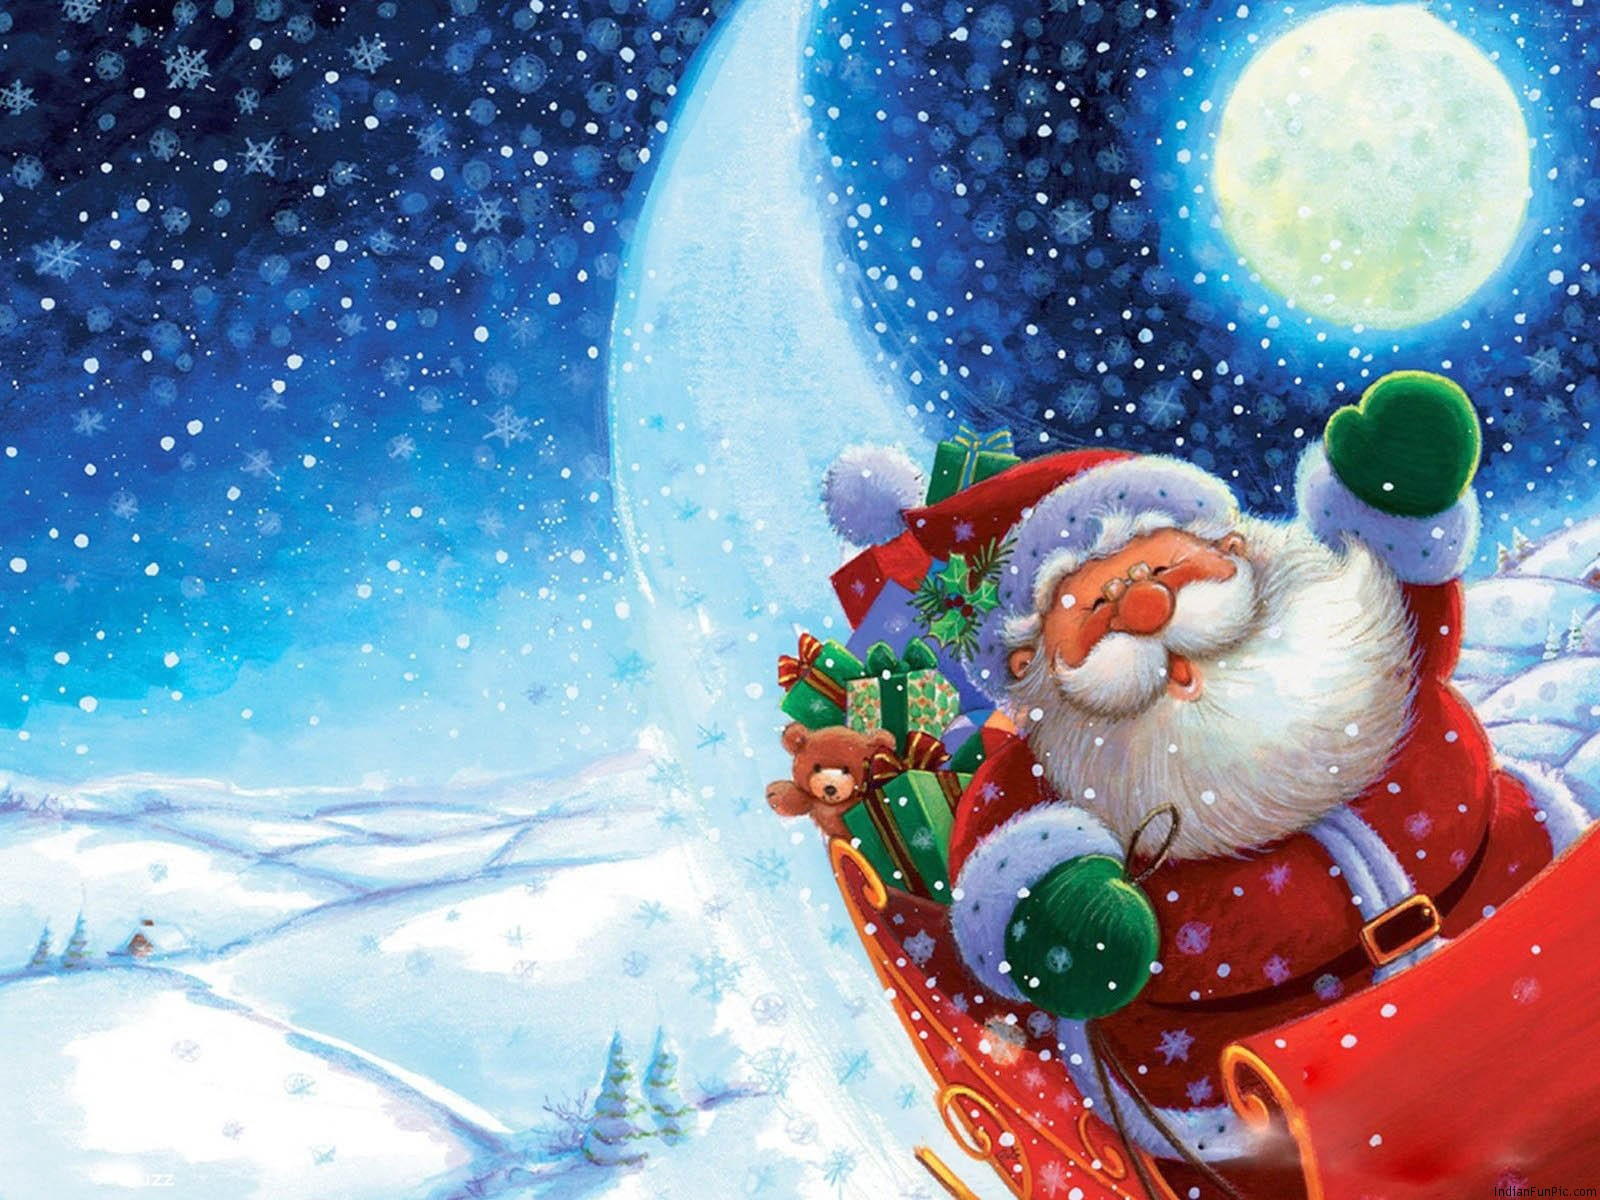 Funny Christmas Wallpapers 1600x1200